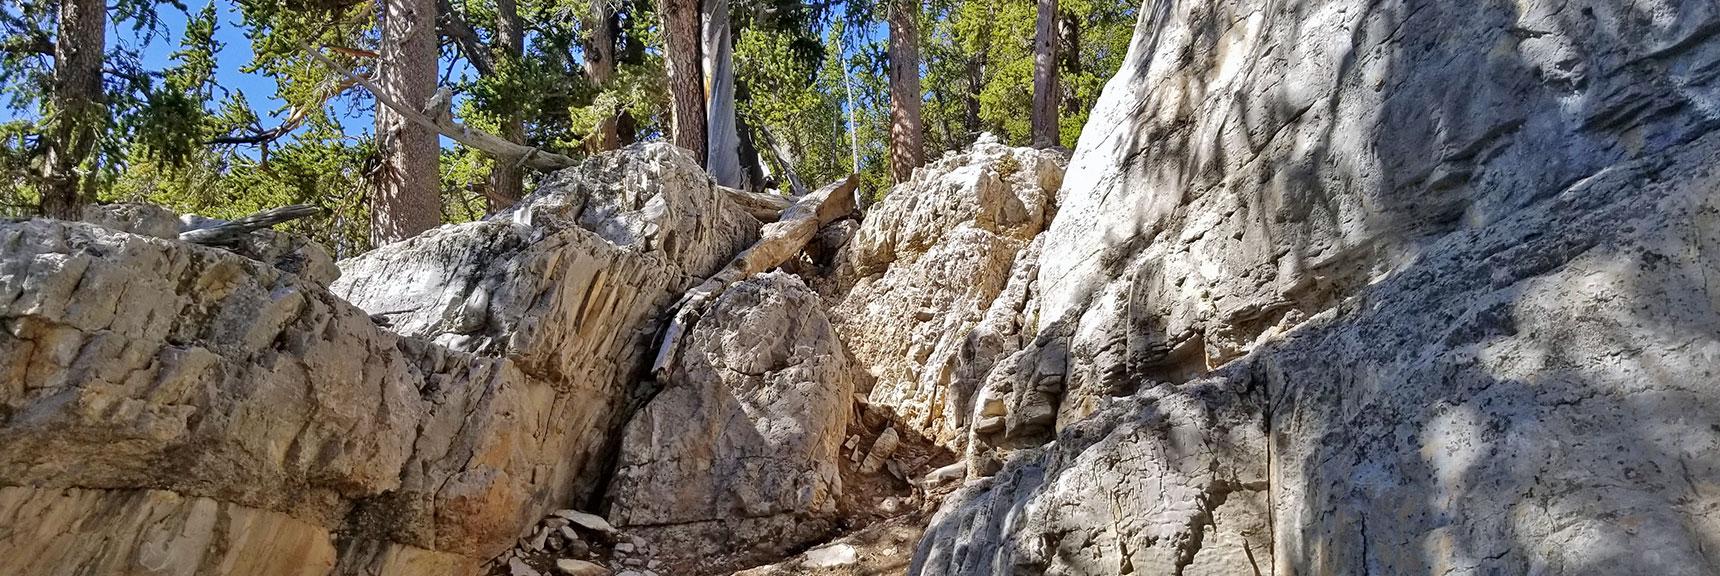 Brief Class 3 Climb on the Way to Mummy's Knees | Mummy Mountain's Knees | Mt. Charleston Wilderness, Nevada 016